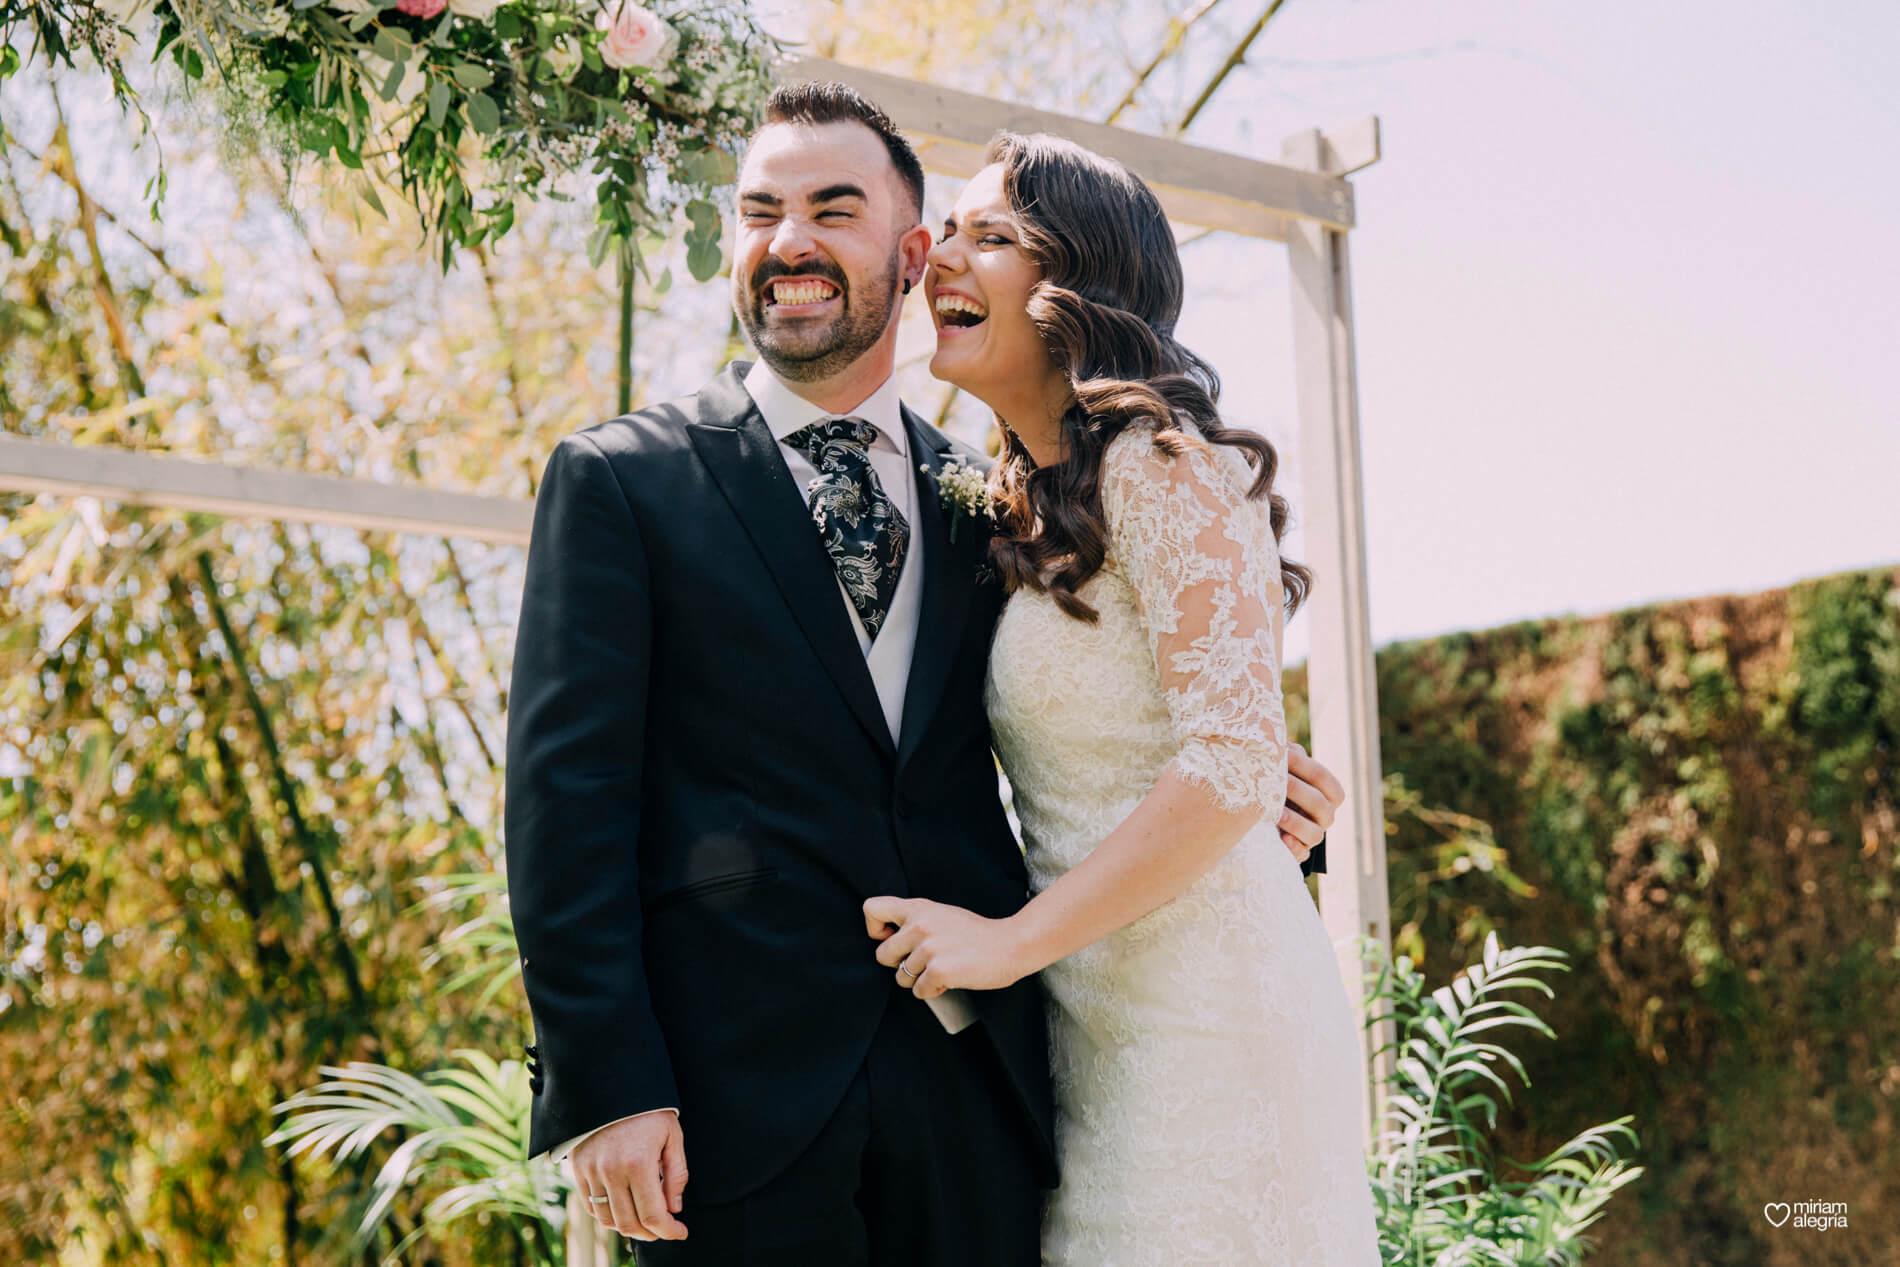 boda-en-finca-jurosa-miriam-alegria-68